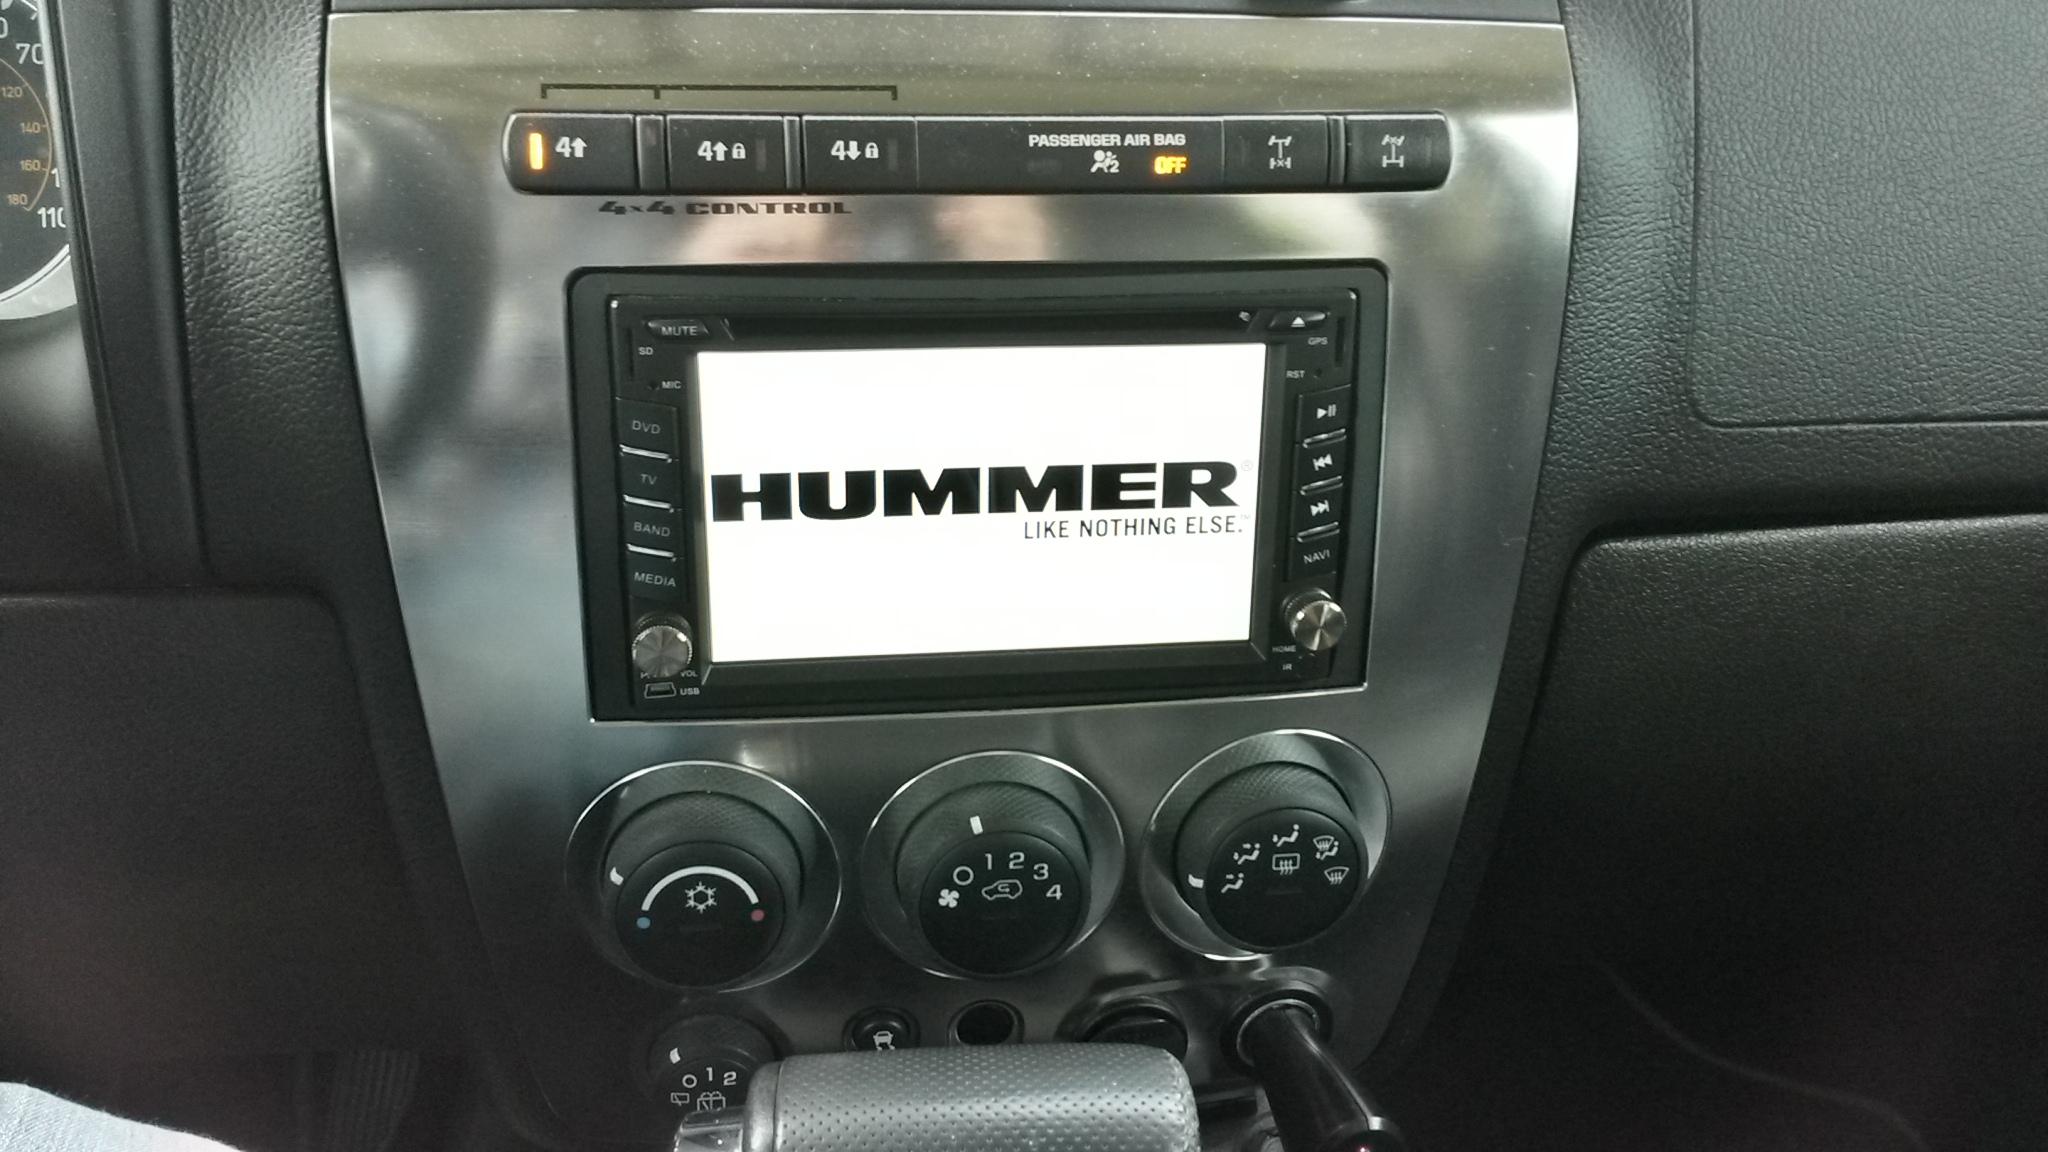 2009 Hummer H3 5 3 V8 6L80e Lockers 4 1 Transfer Case